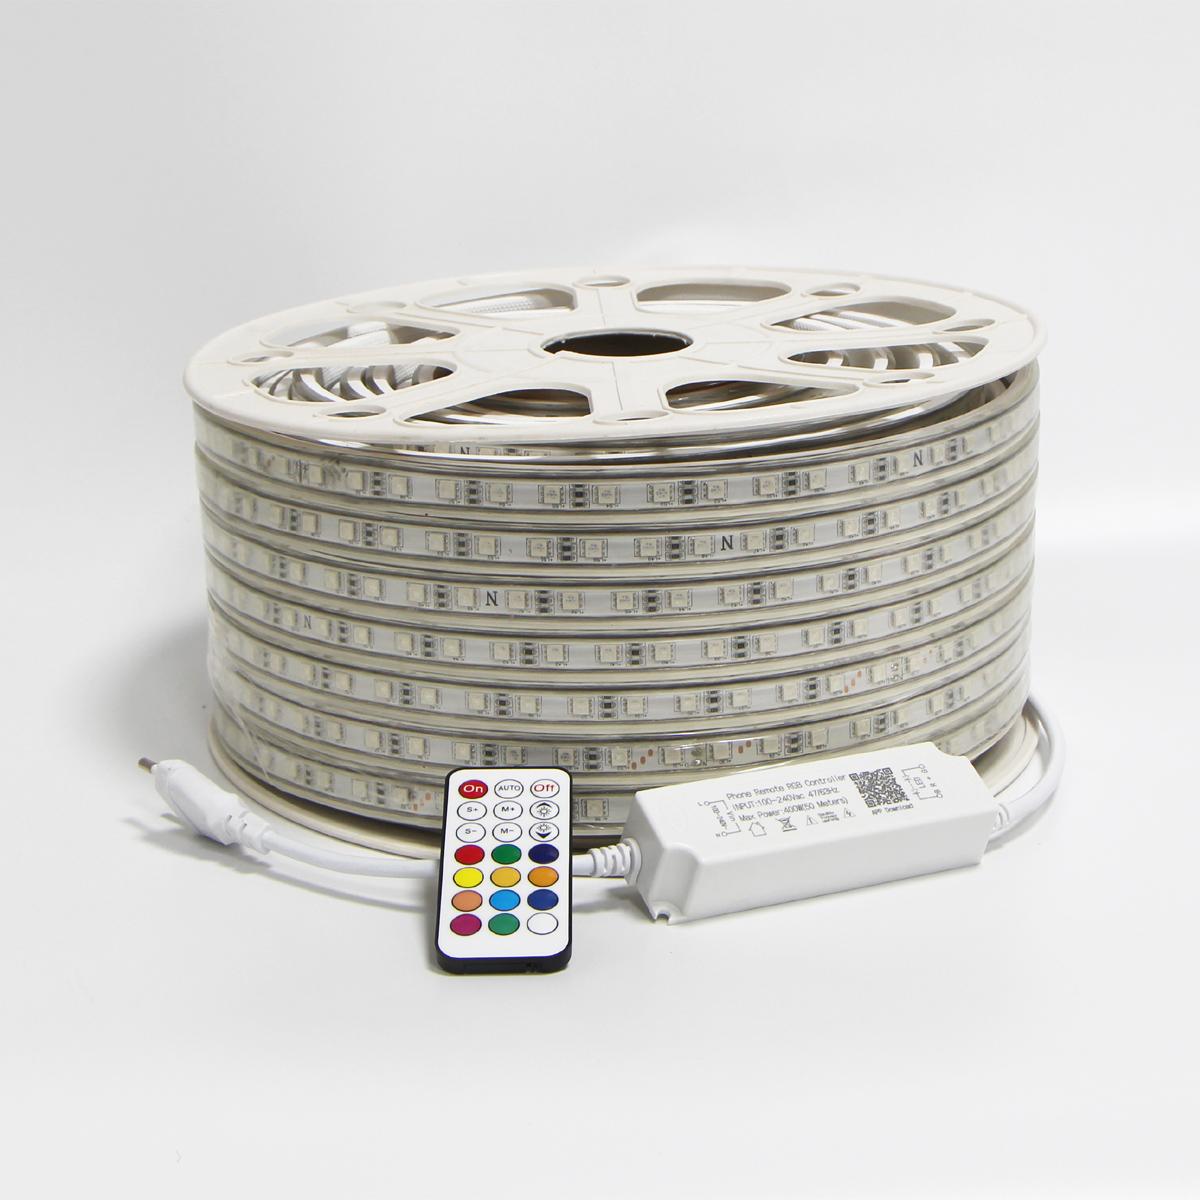 220V 110V RGB LED Strip Lights 5050 50m 100m multicolor flexible roll IP65 Outdoor Waterproof Dual Color Rope Led Light Strip